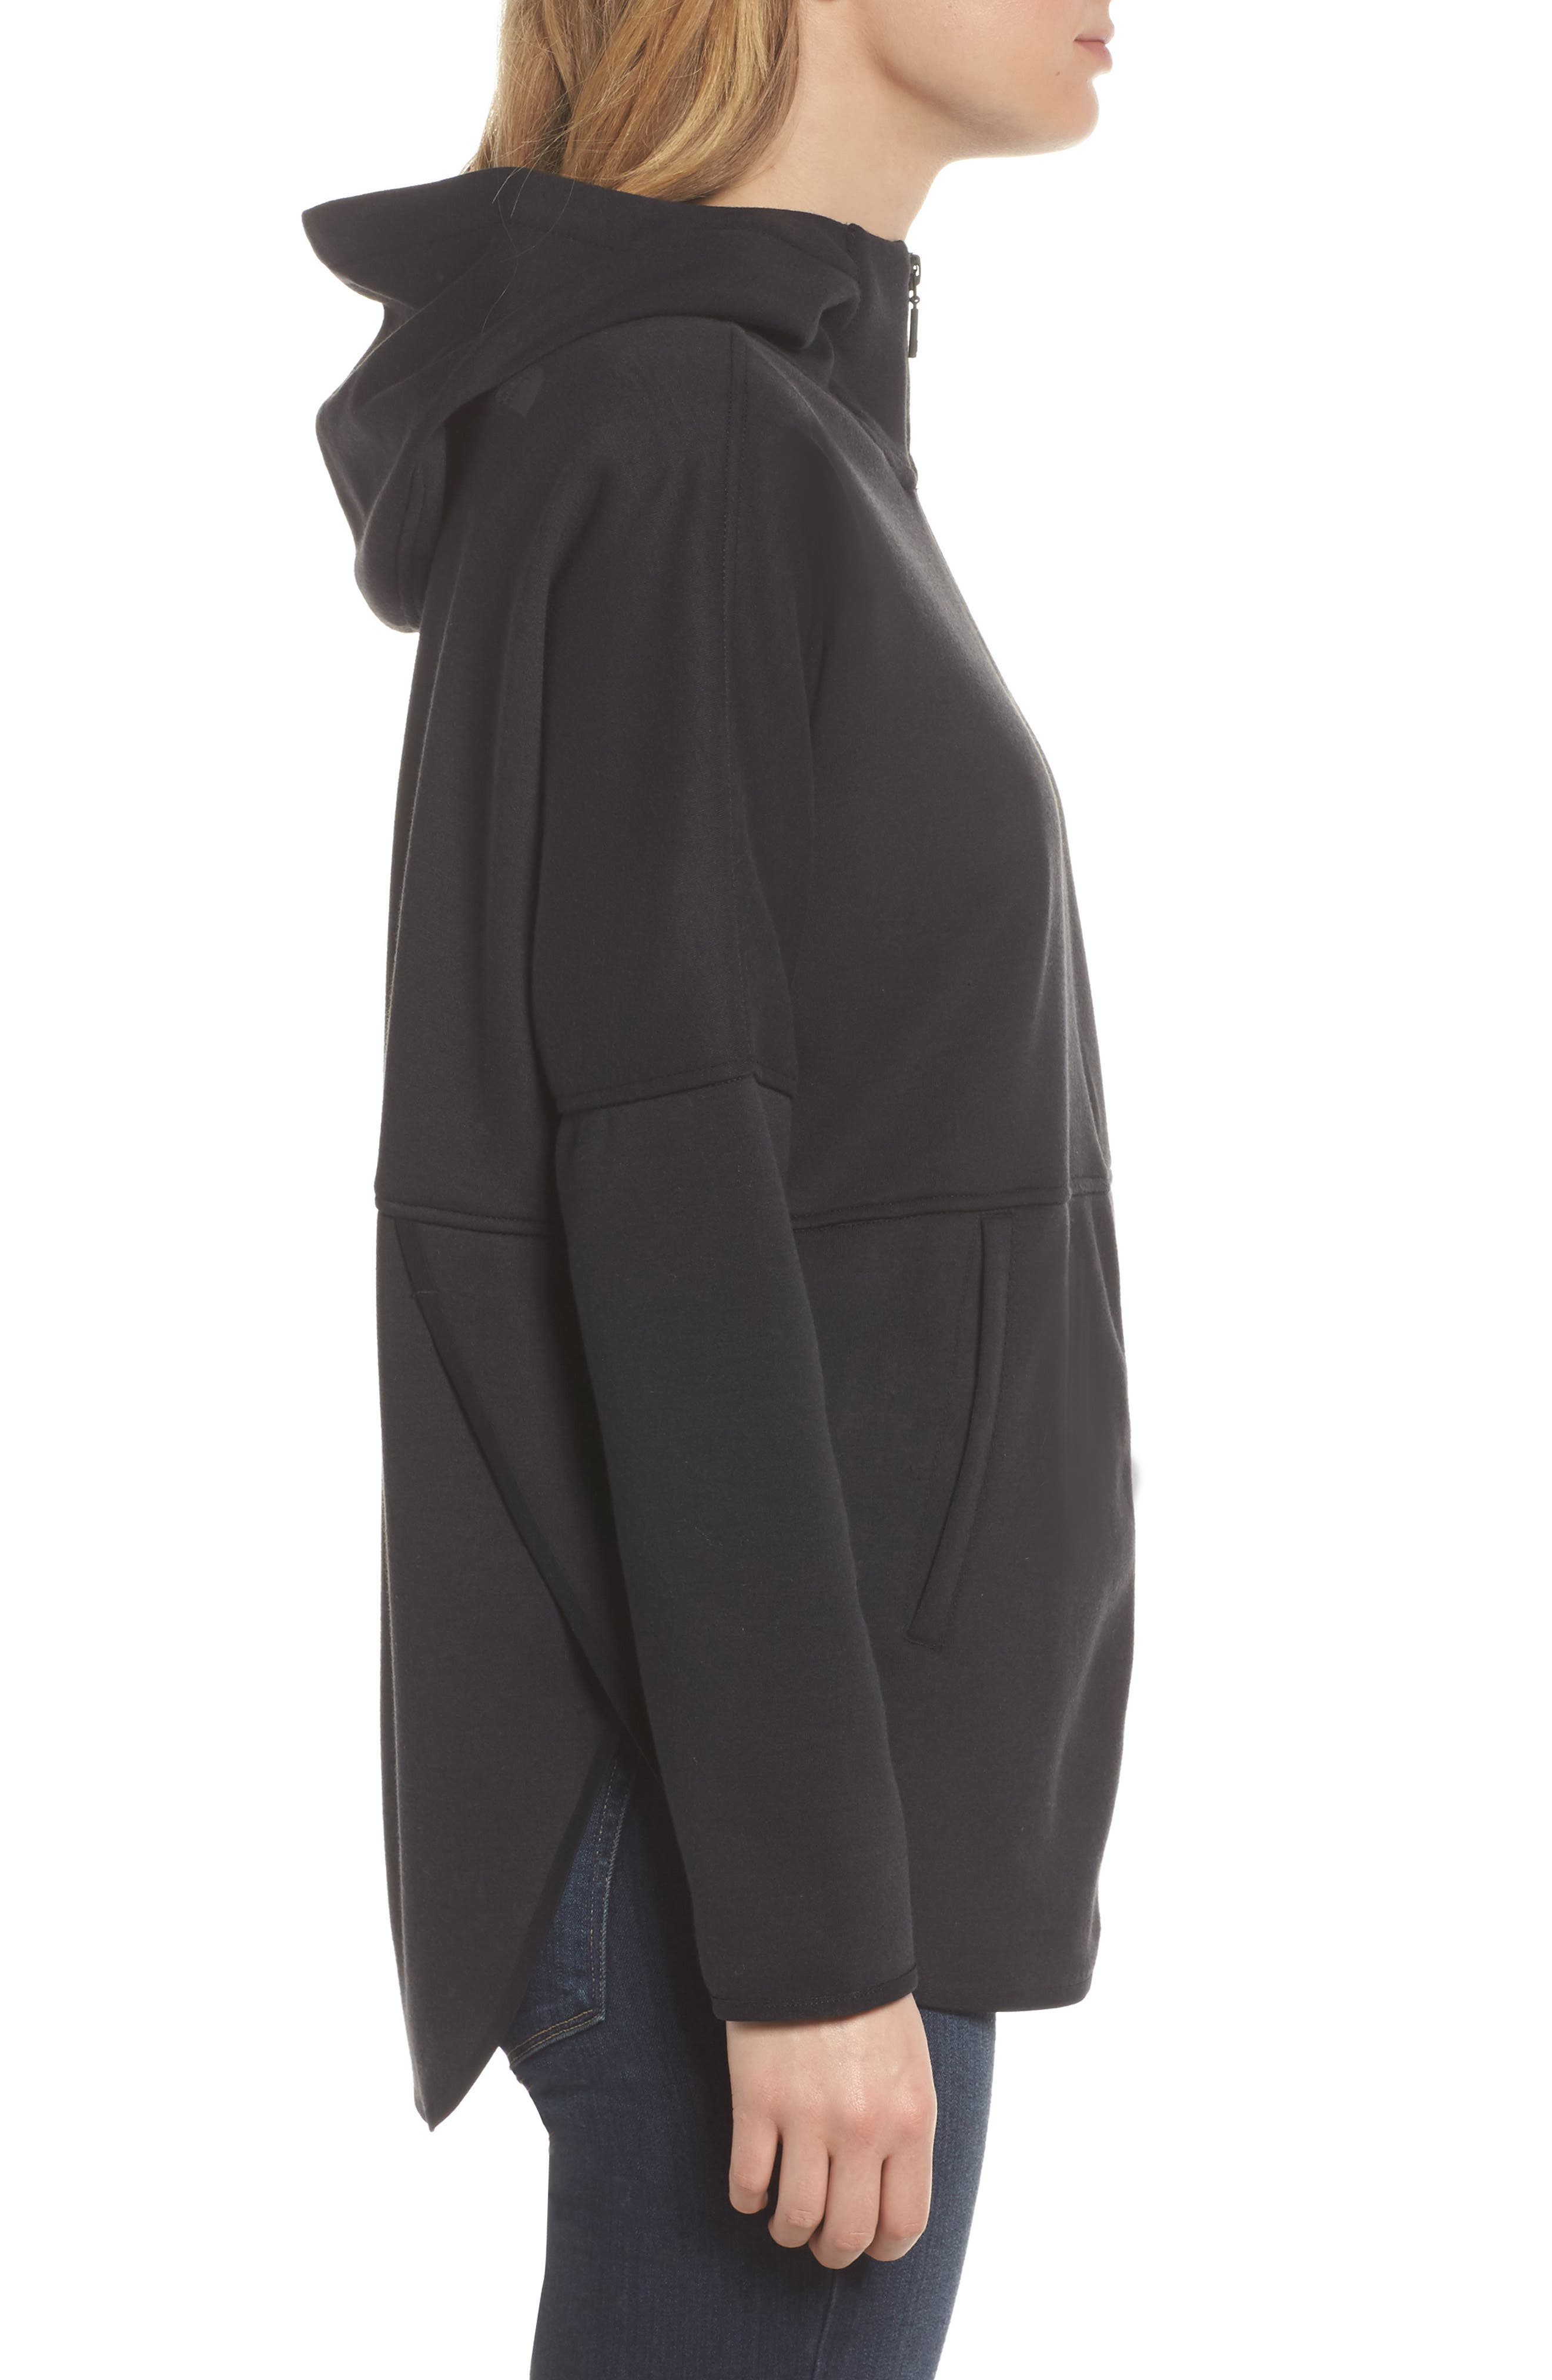 Slacker Hooded Jacket,                             Alternate thumbnail 3, color,                             Tnf Black